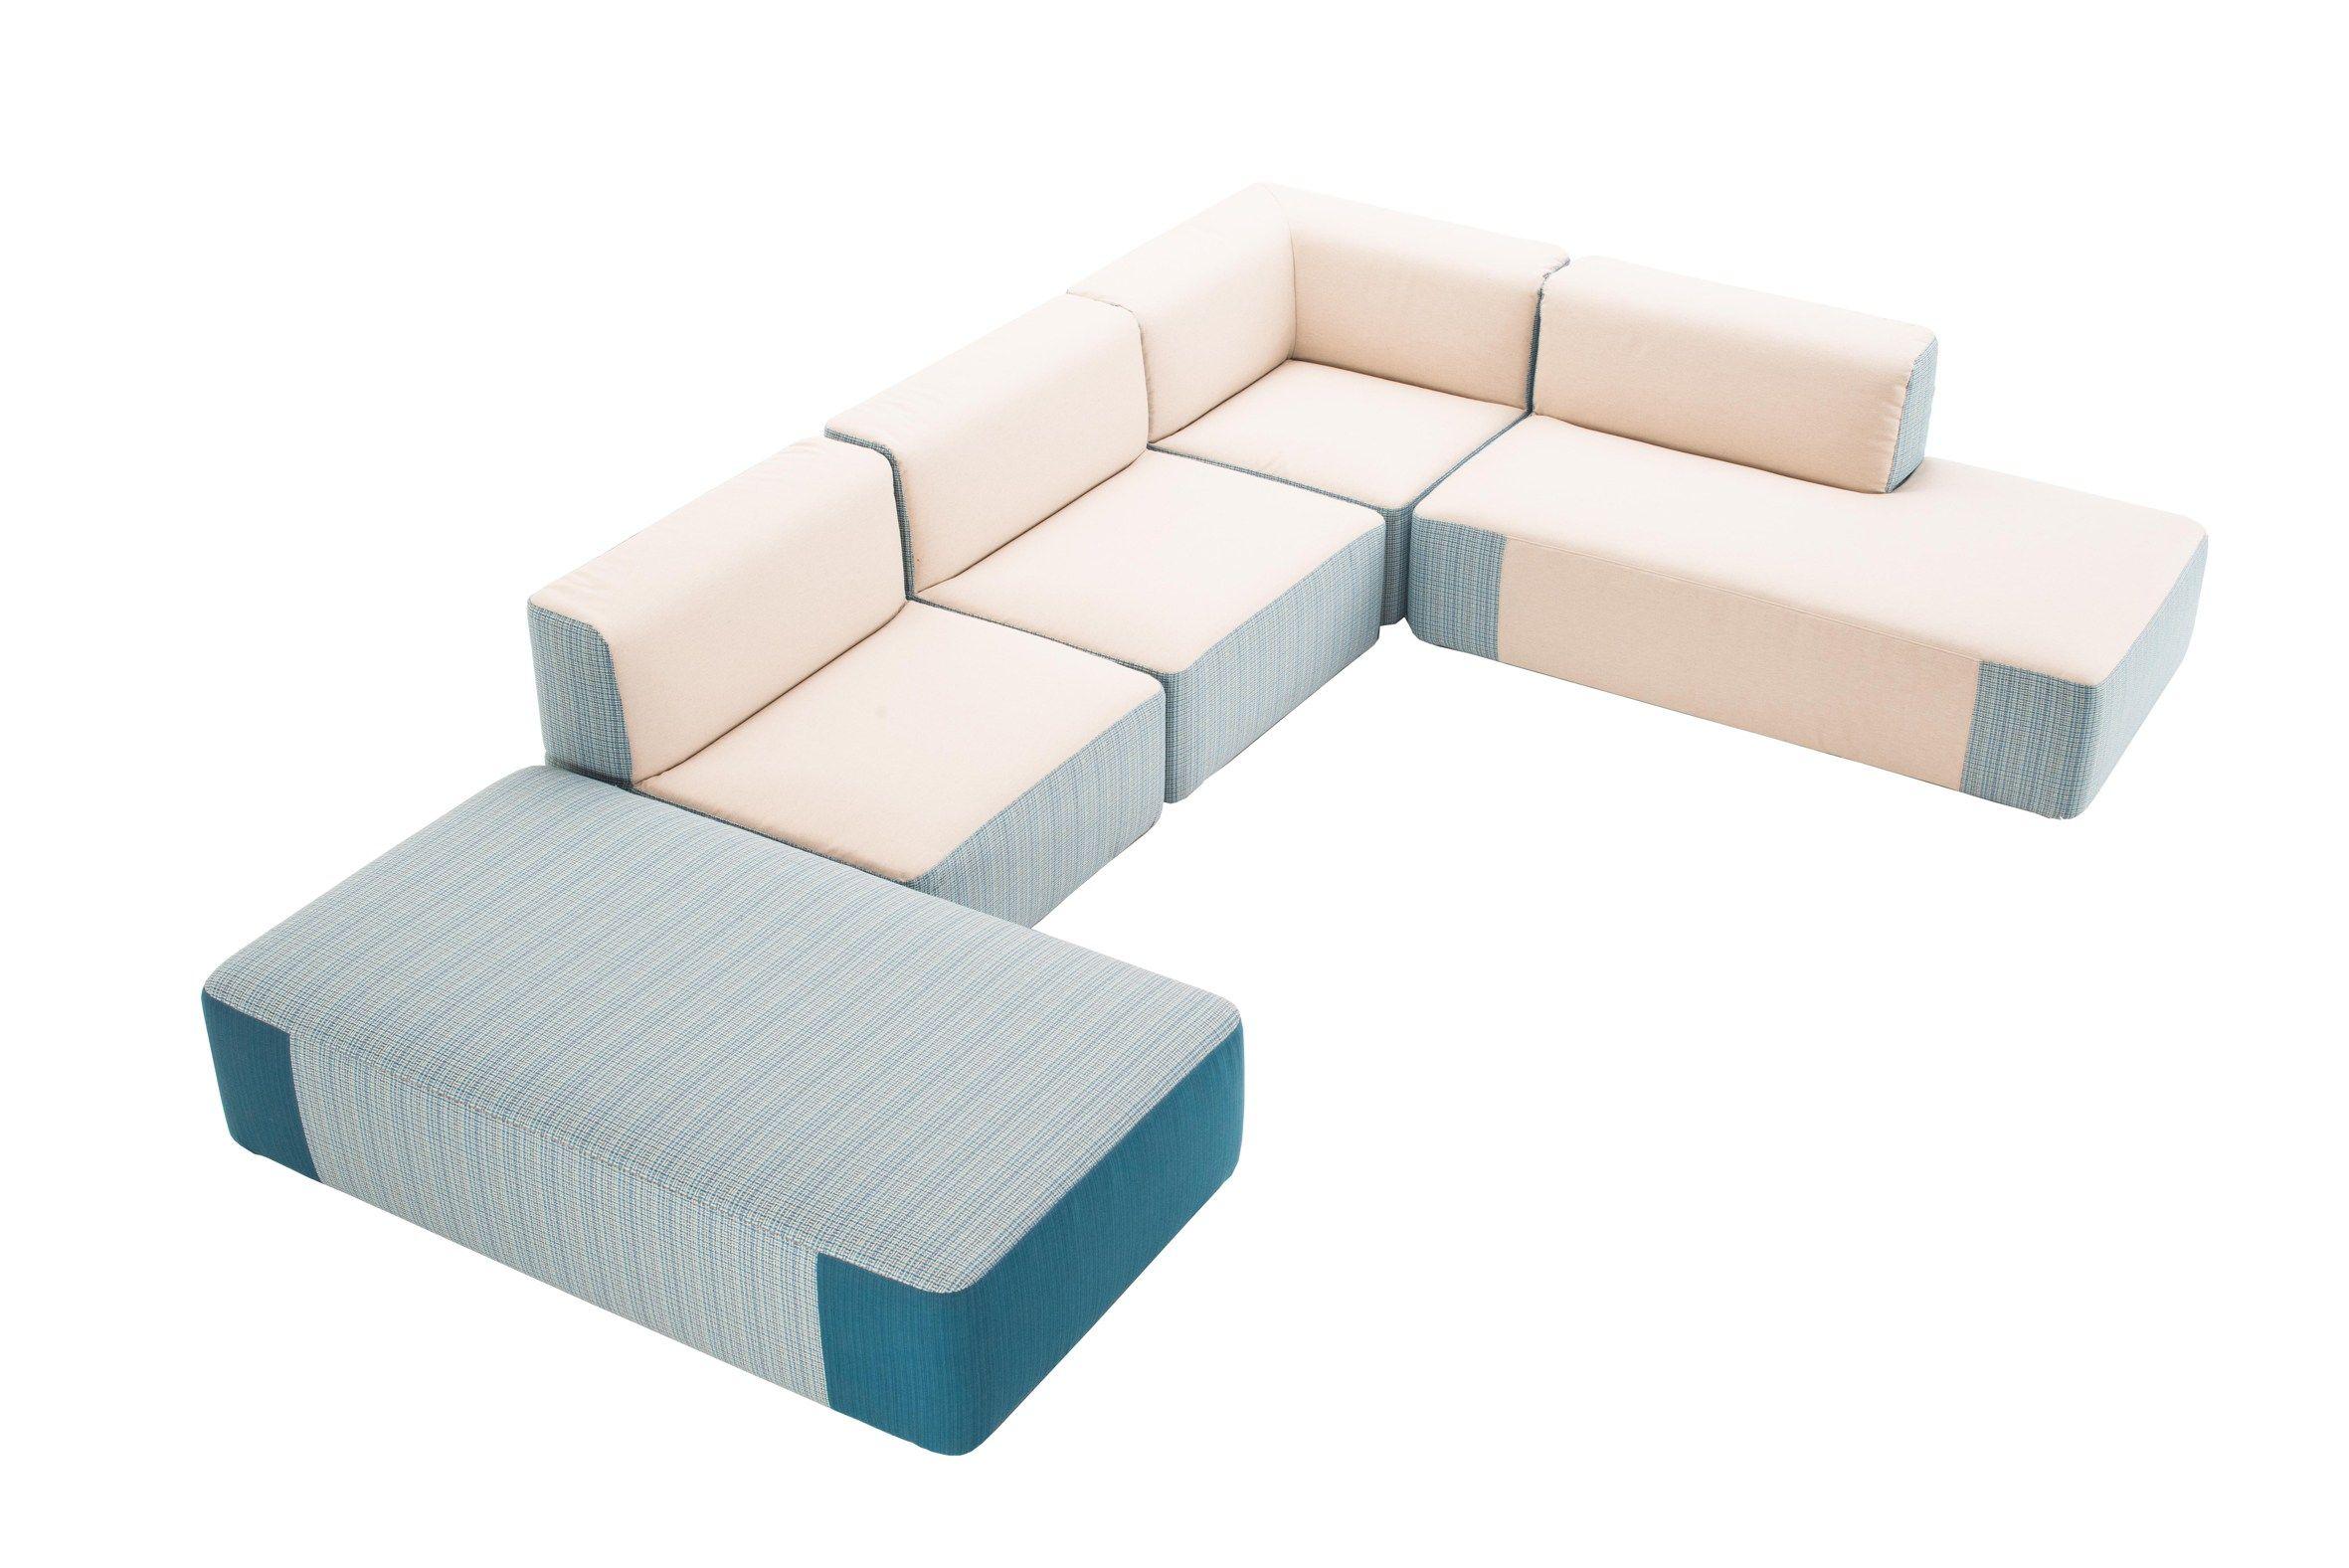 Belt Modular Sectional Sofa By Daniele Lo Scalzo Moscheri For Varaschin Modular Sectional Sofa Sectional Sofa Modular Sofa